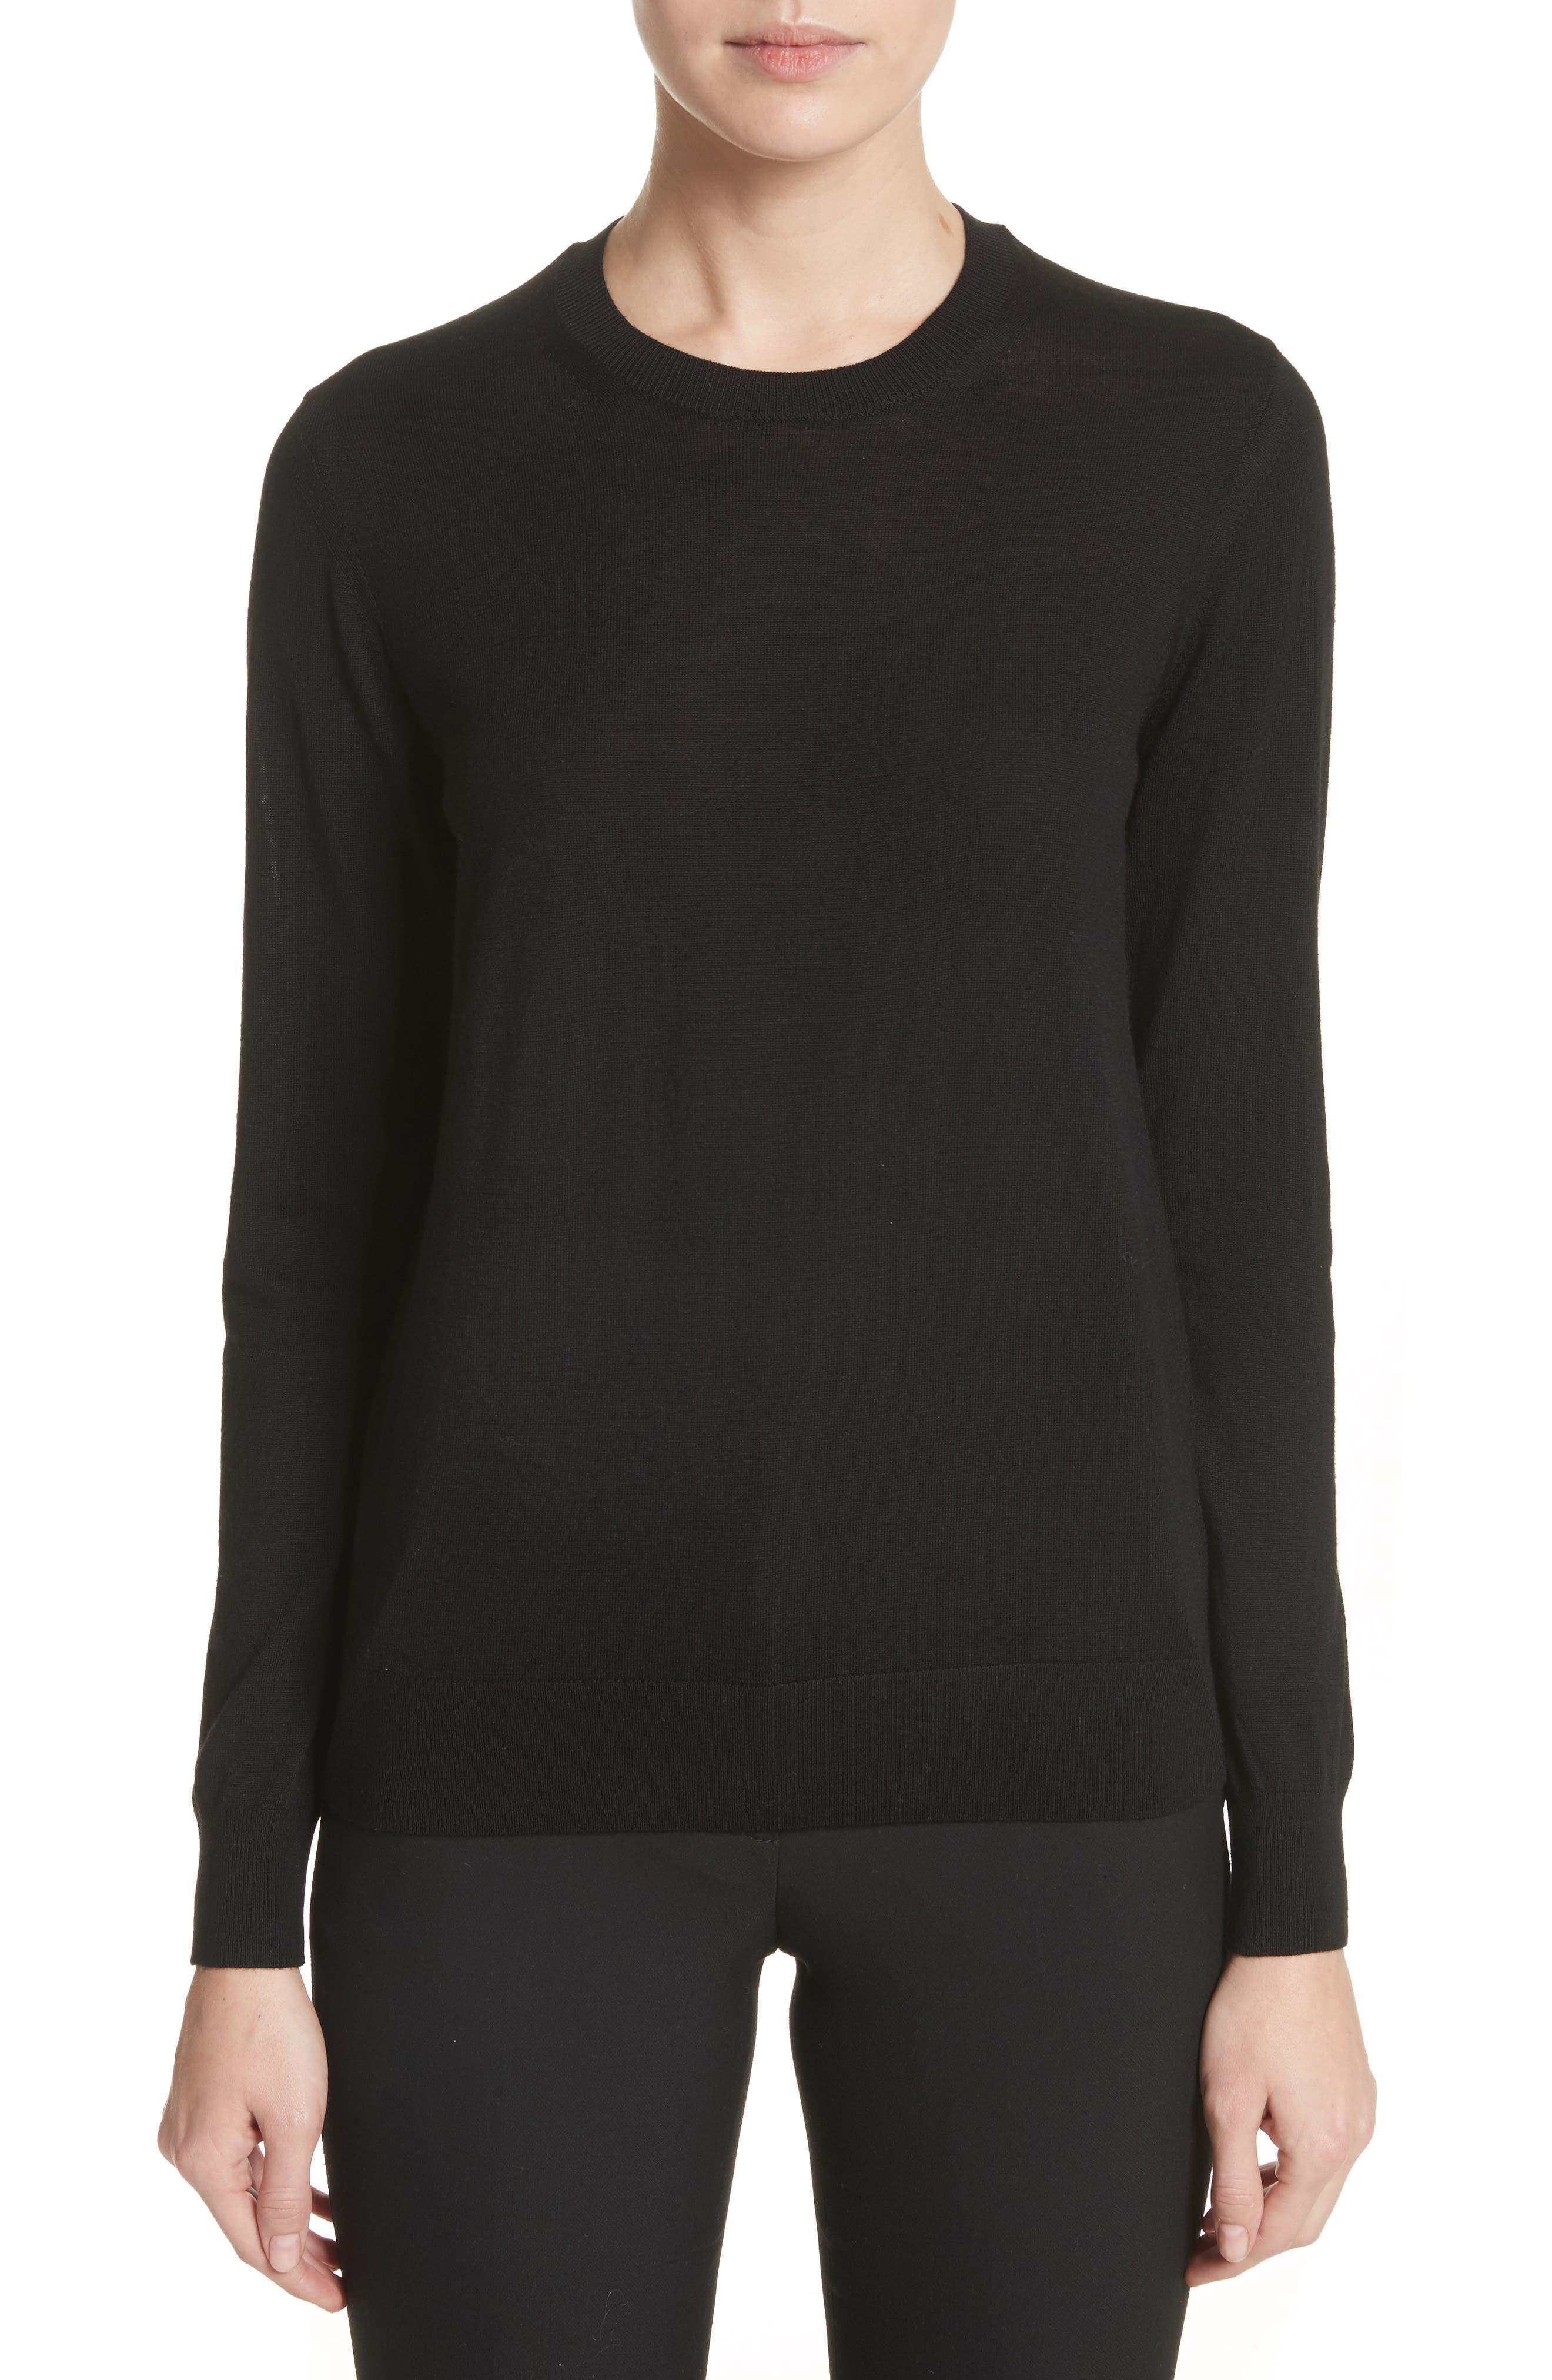 Red Designer Sweaters: Cardigans, Crewneck & Pullovers | Nordstrom